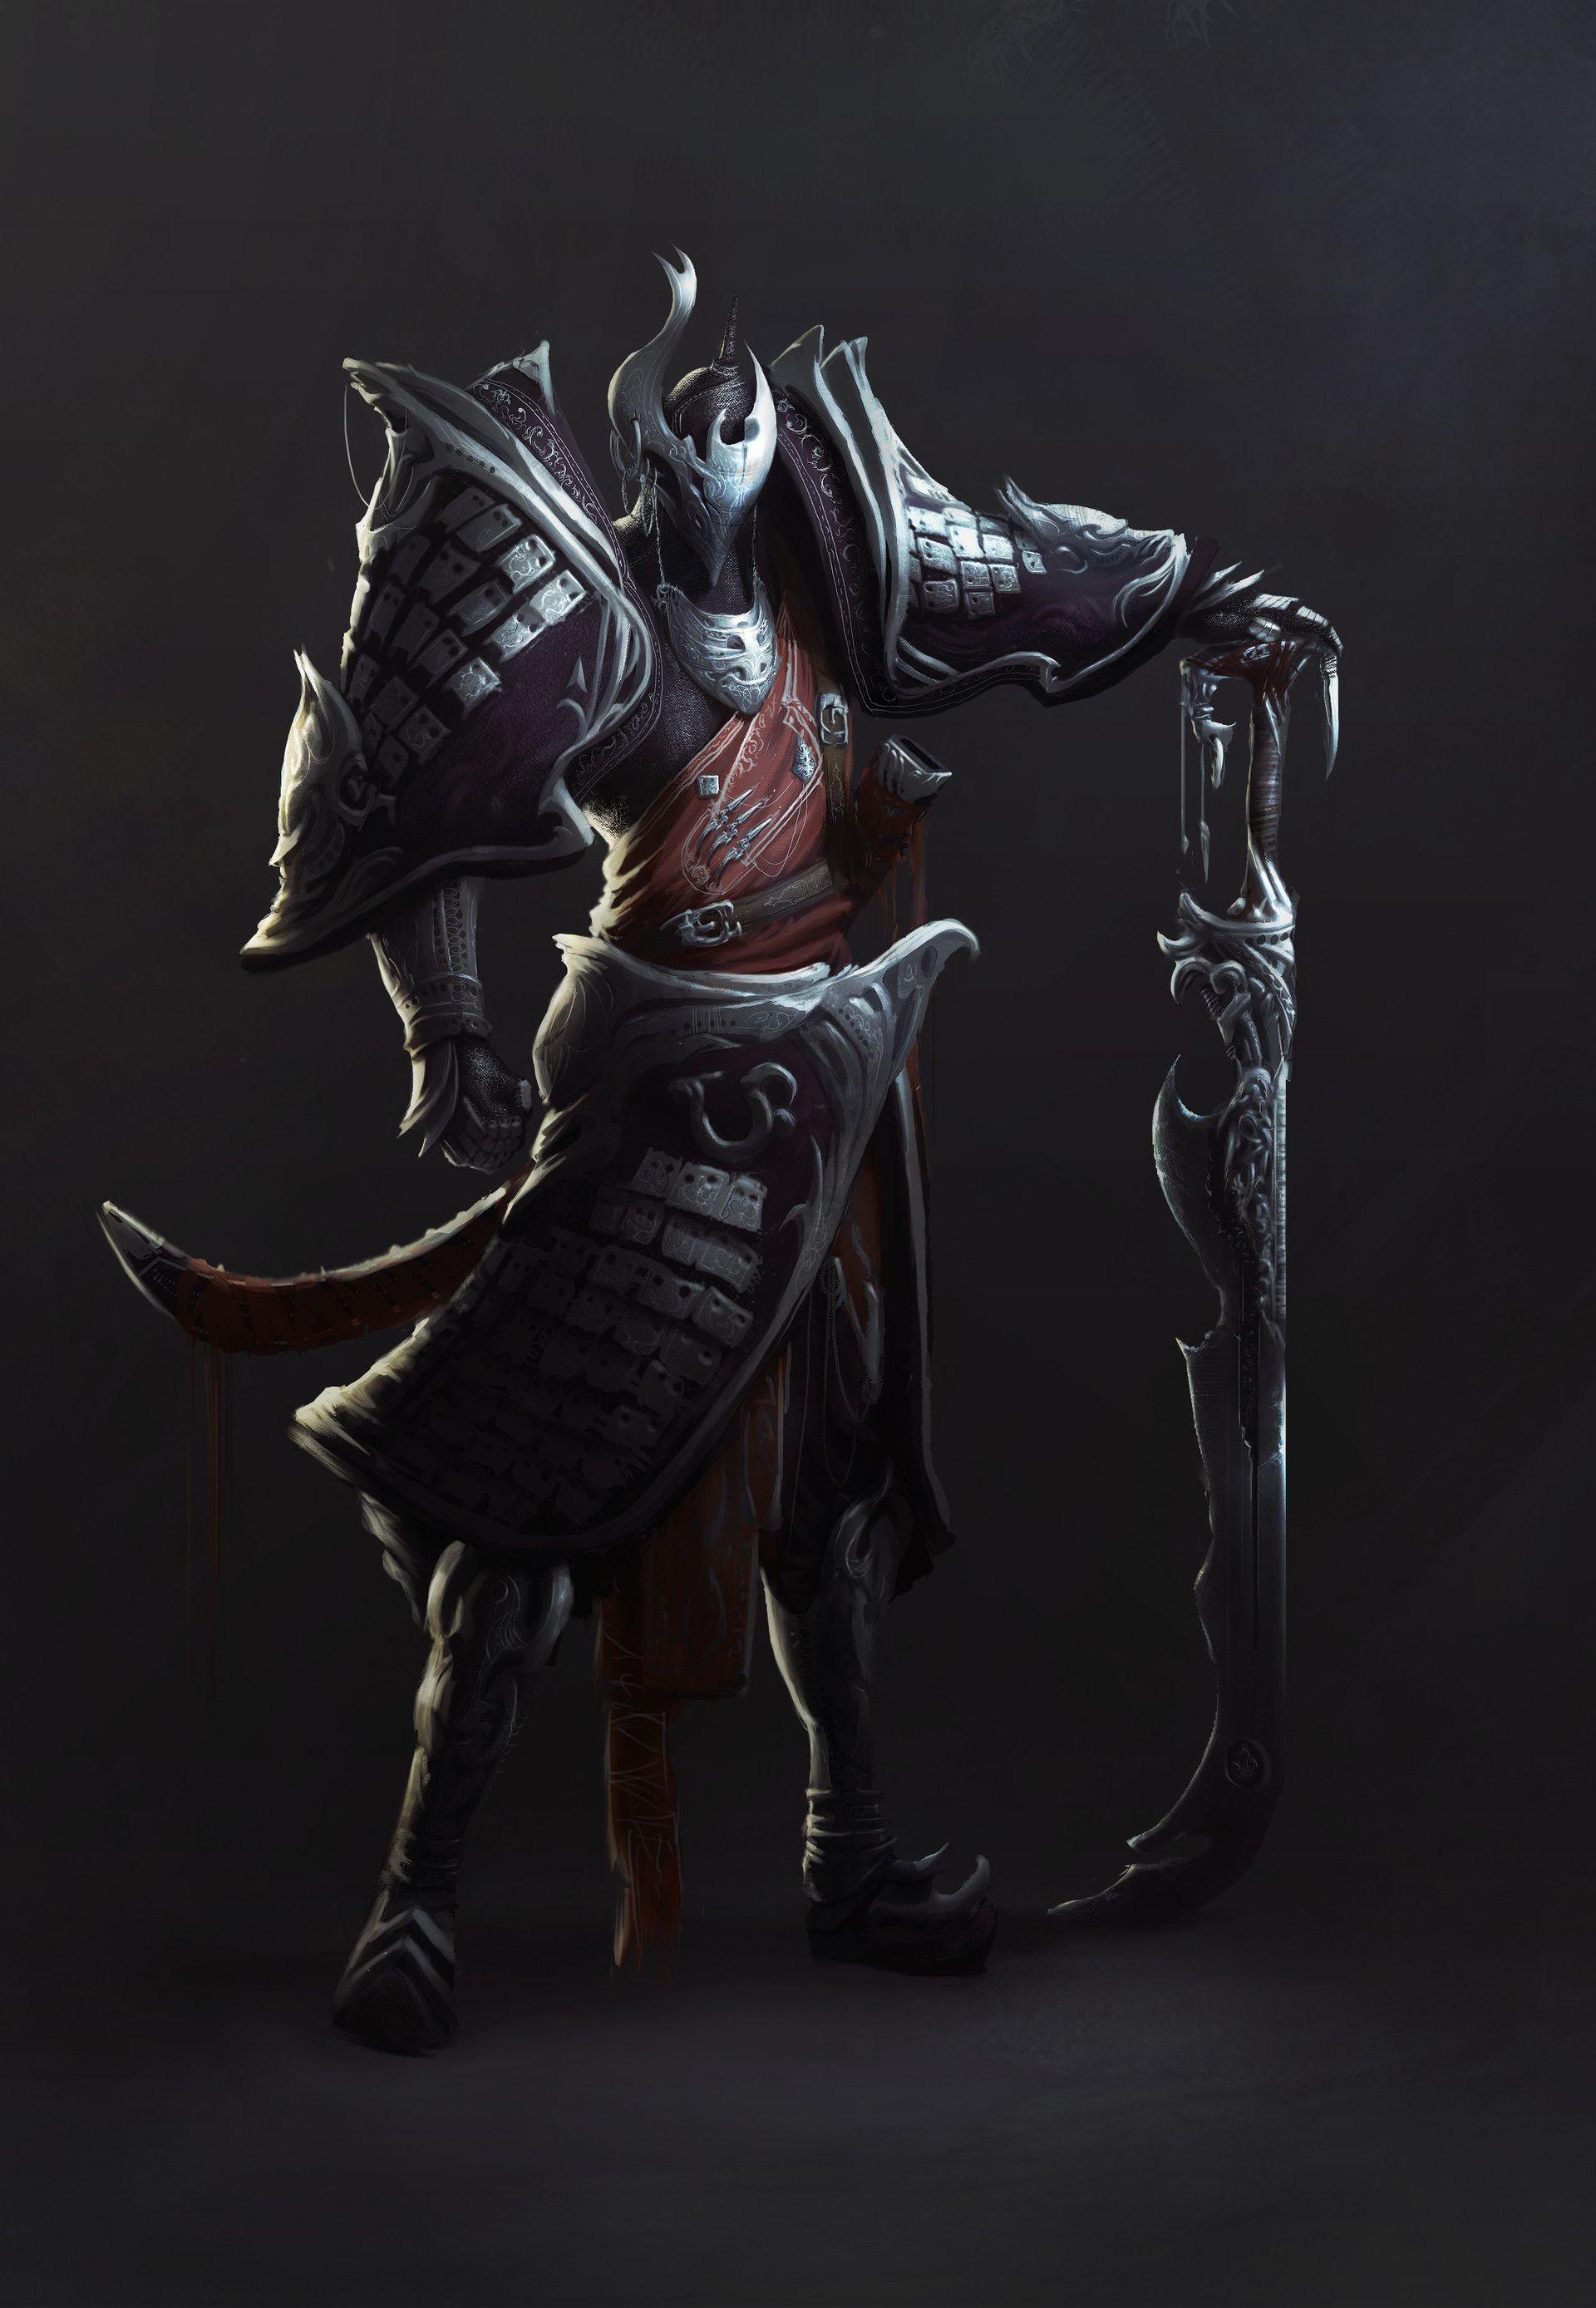 ArtStation - Warlord, Girma Moges